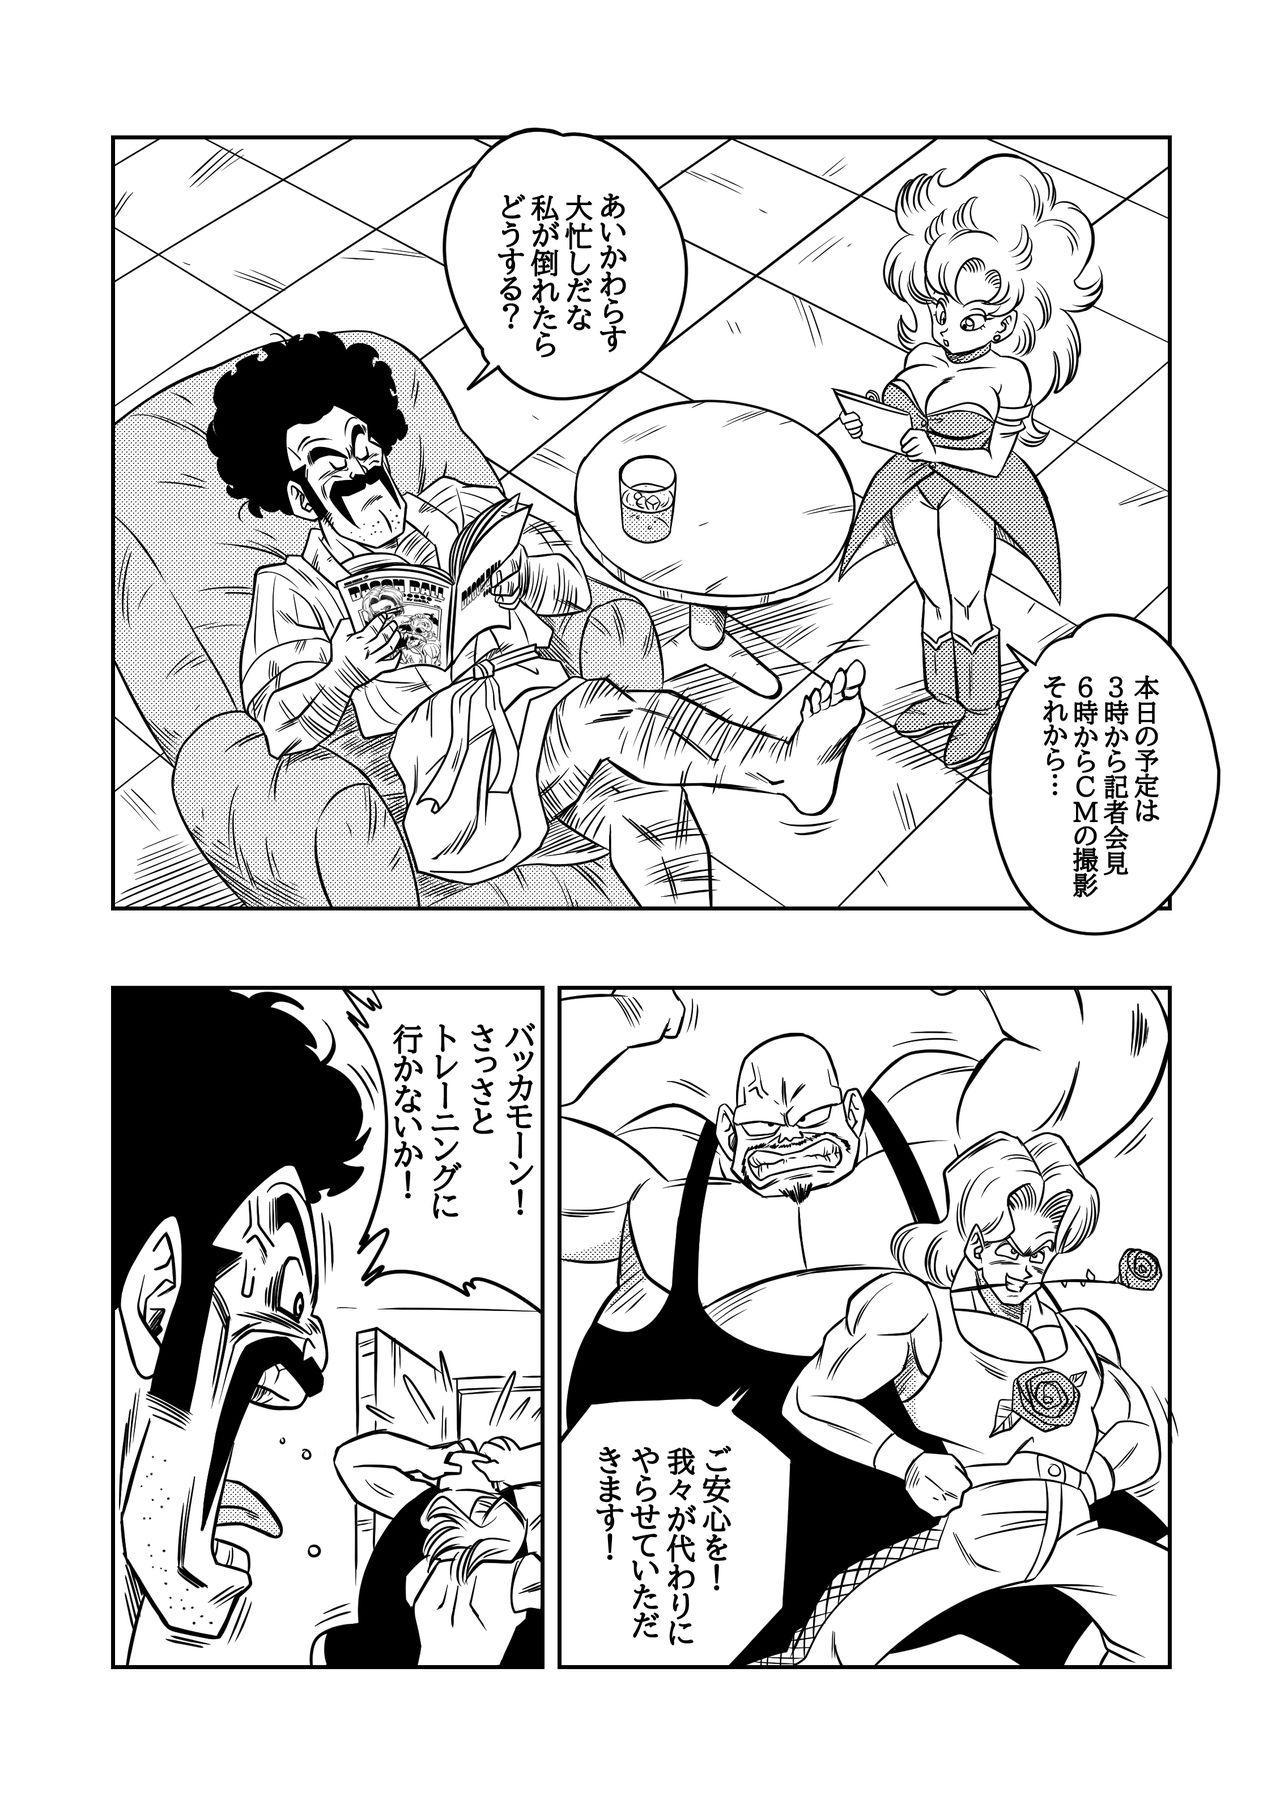 Mister Satan no Himitsu no Training 3